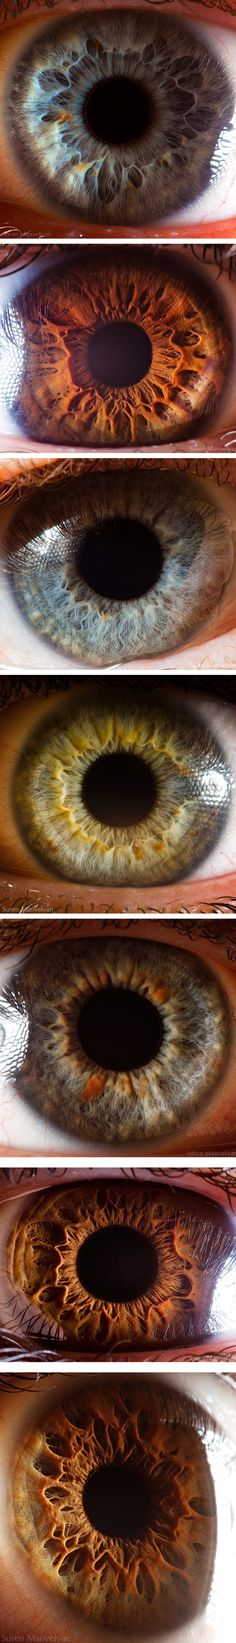 """Eyes"" Photographer Suren Manvelyan's close up images of human and animal eyes. http://www.surenmanvelyan.com/"